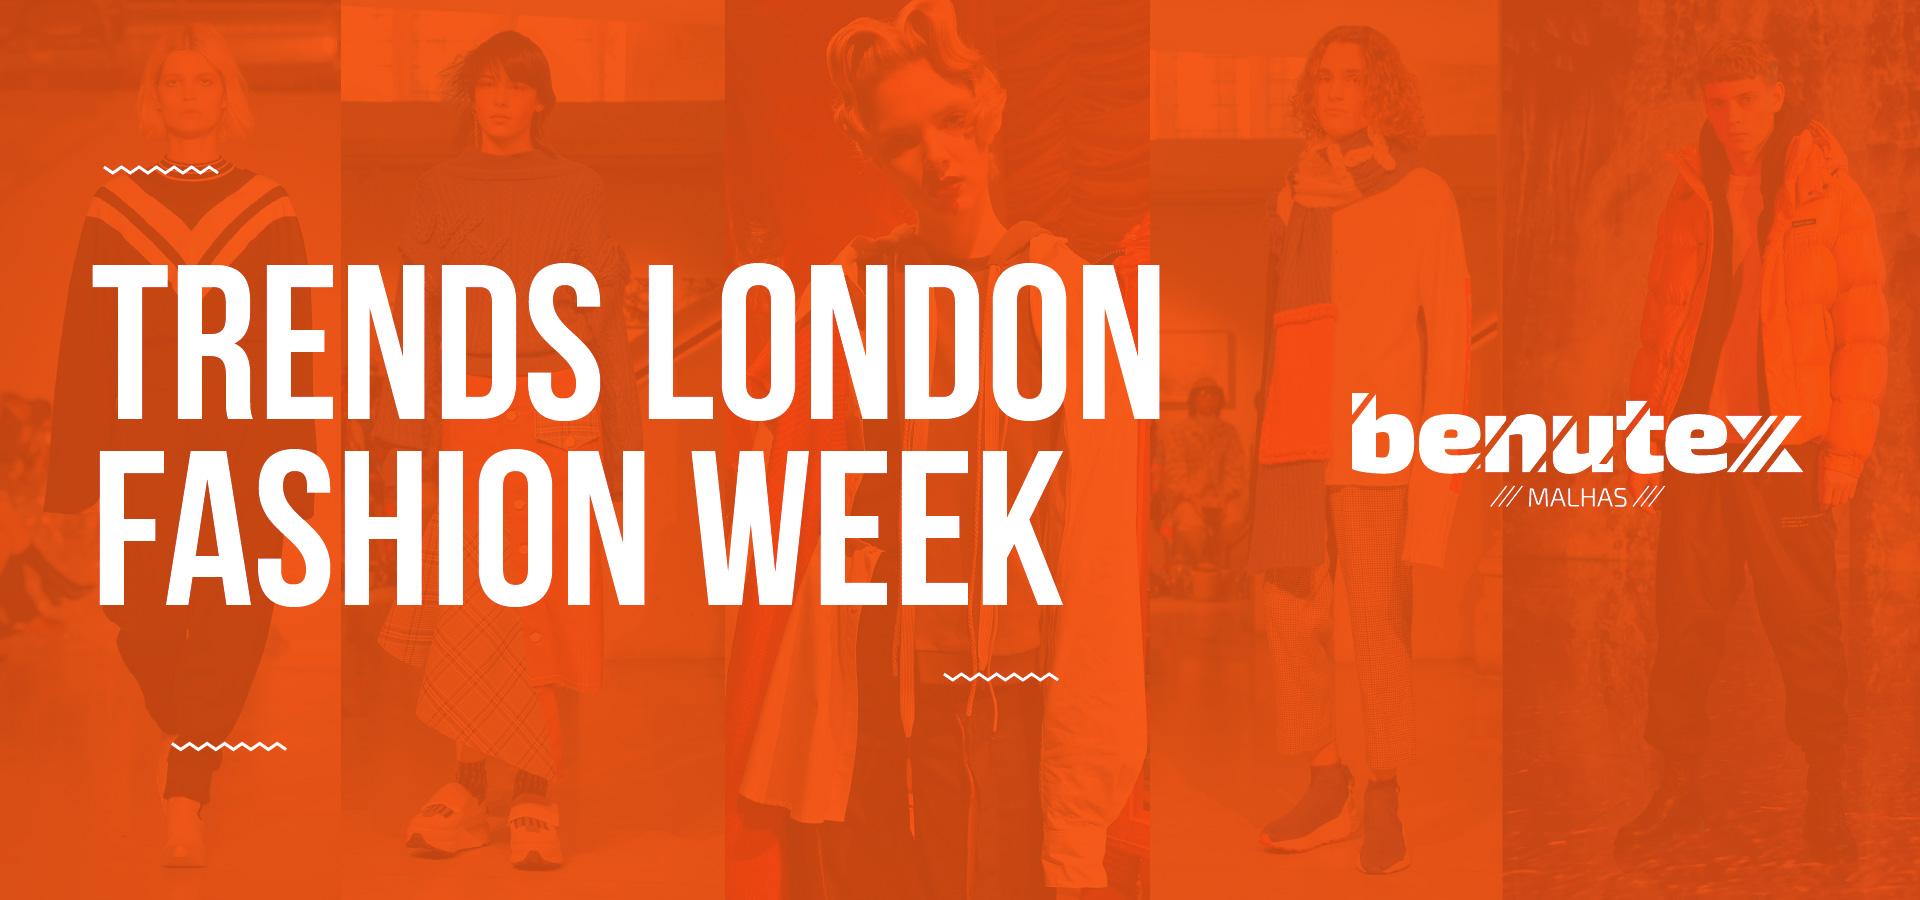 Trends London Fashion Week